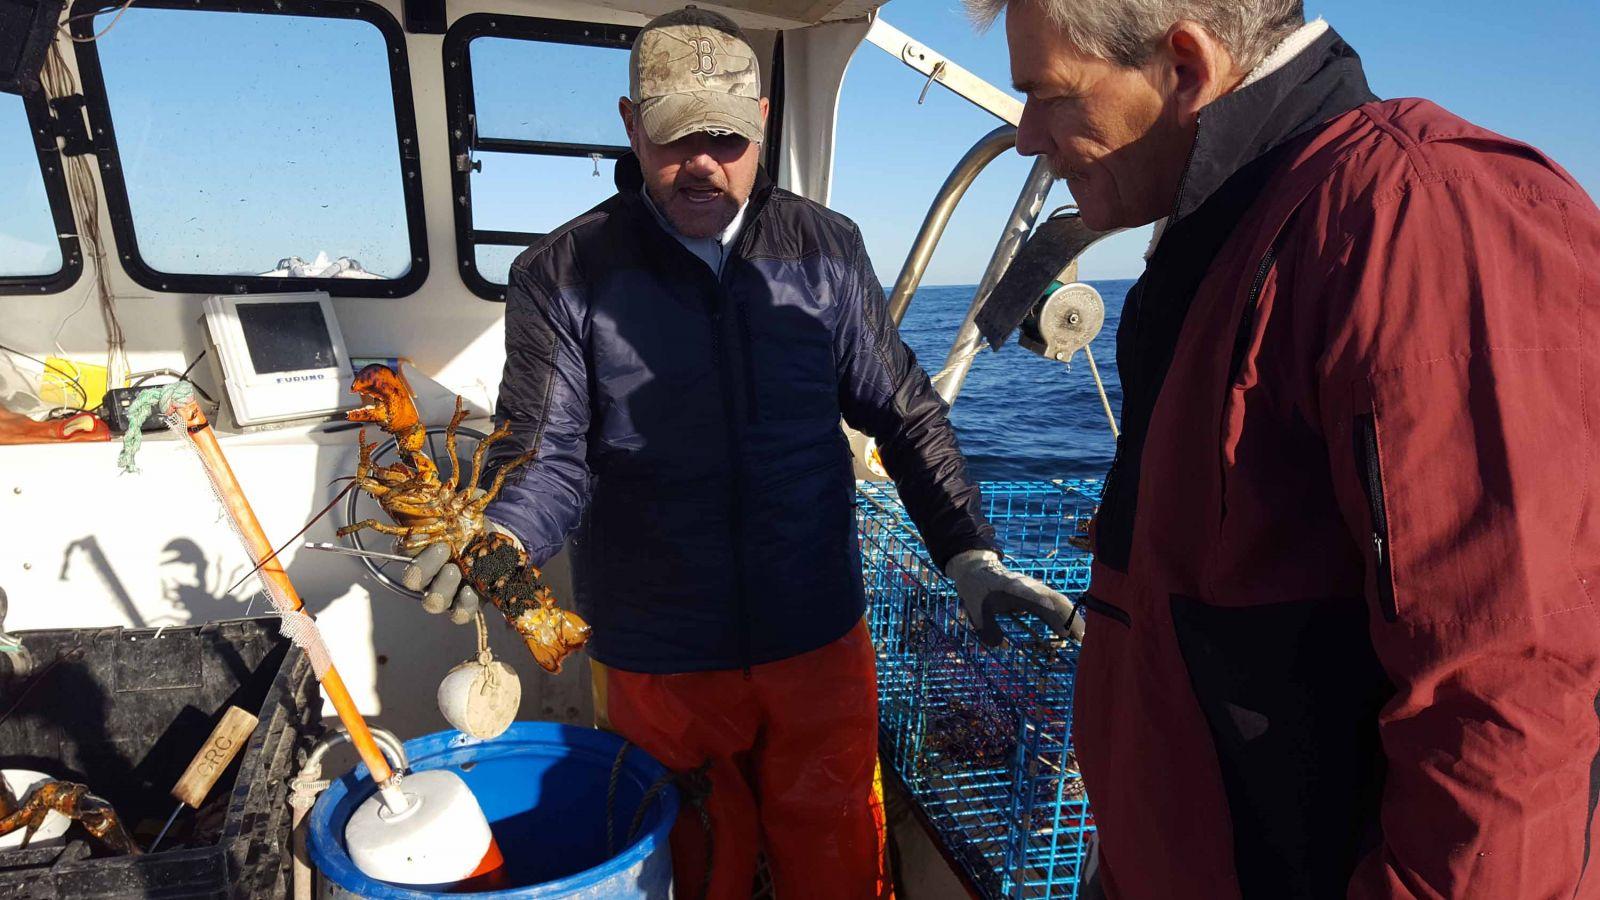 19e35ba078f6b Lobstering with Tucker Jordan and the Maine Lobster Boys